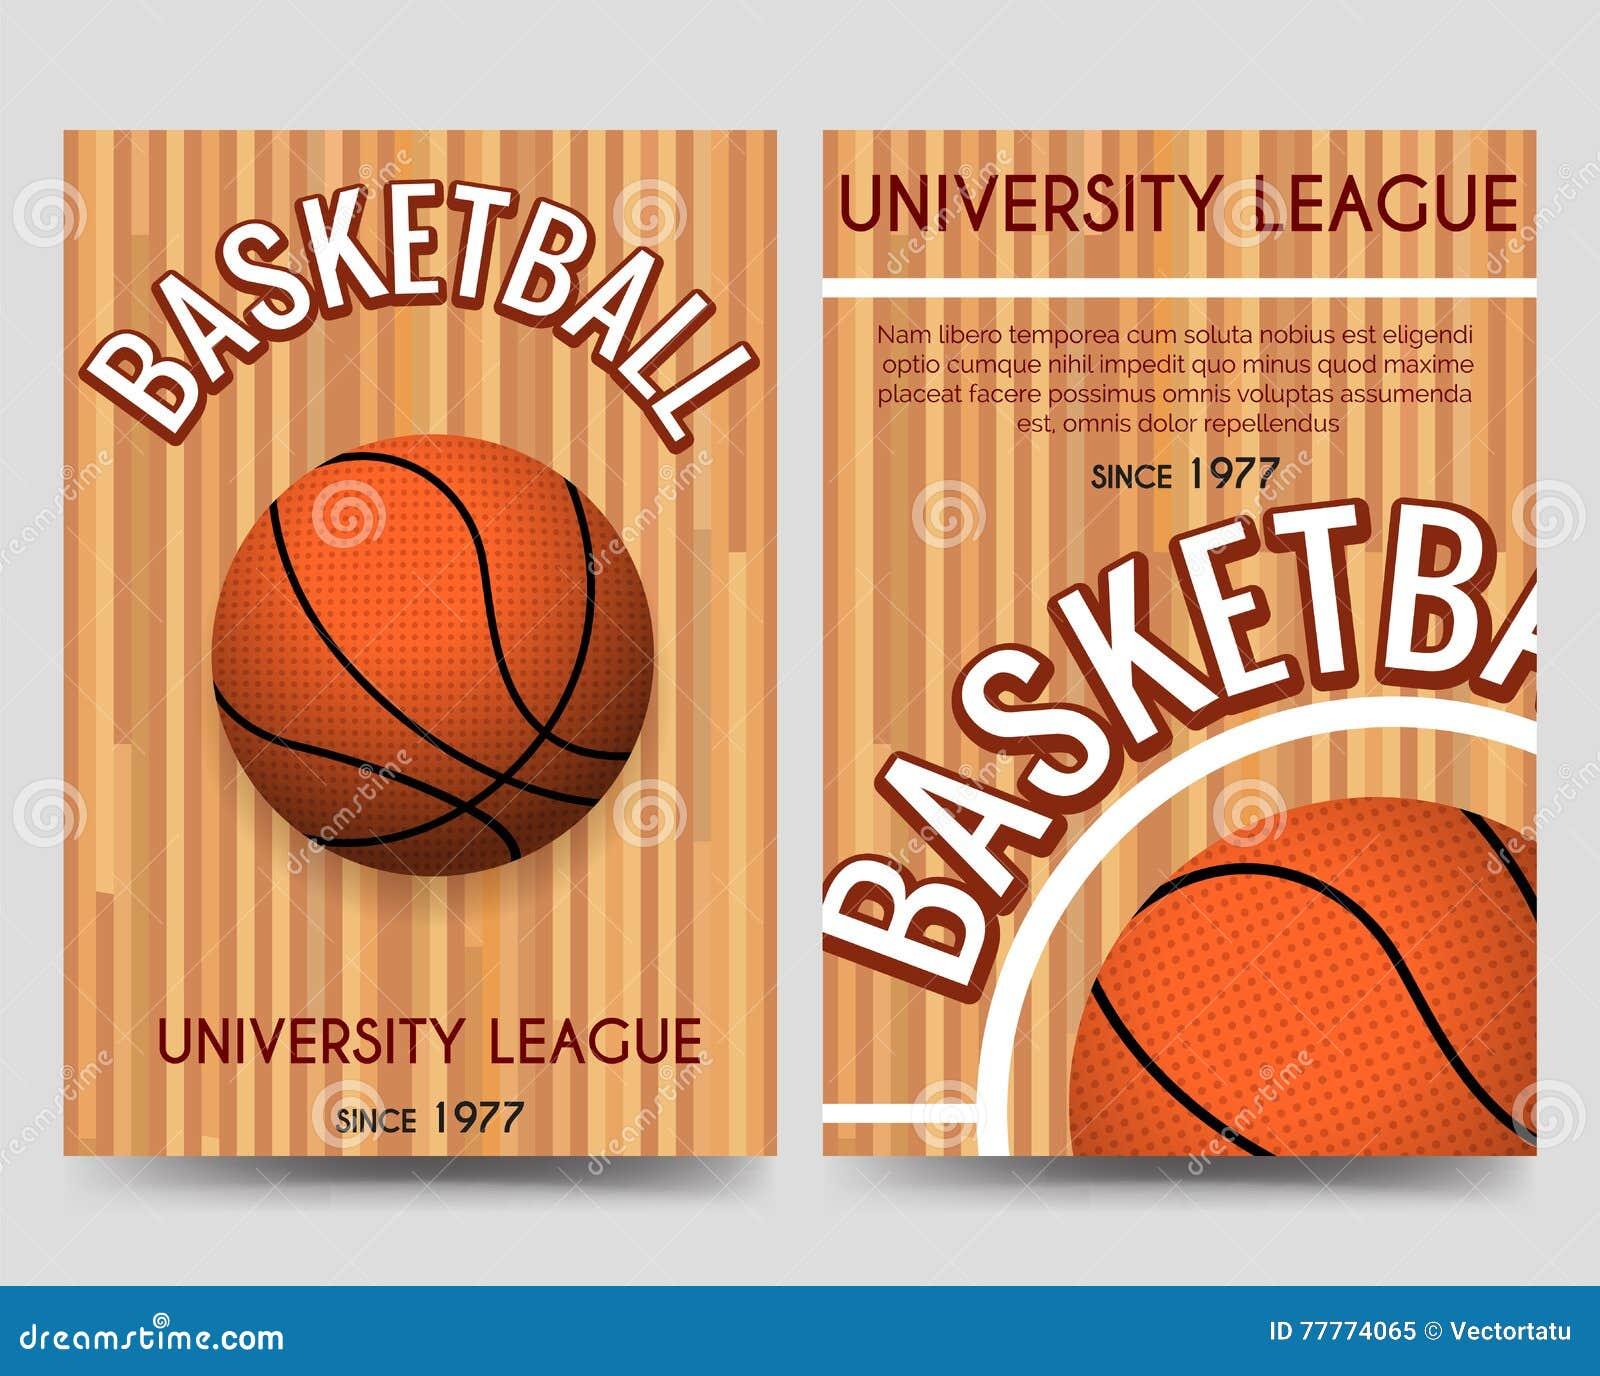 Basketball Flyer Template Free Yelommyphonecompanyco - Basketball flyer template free